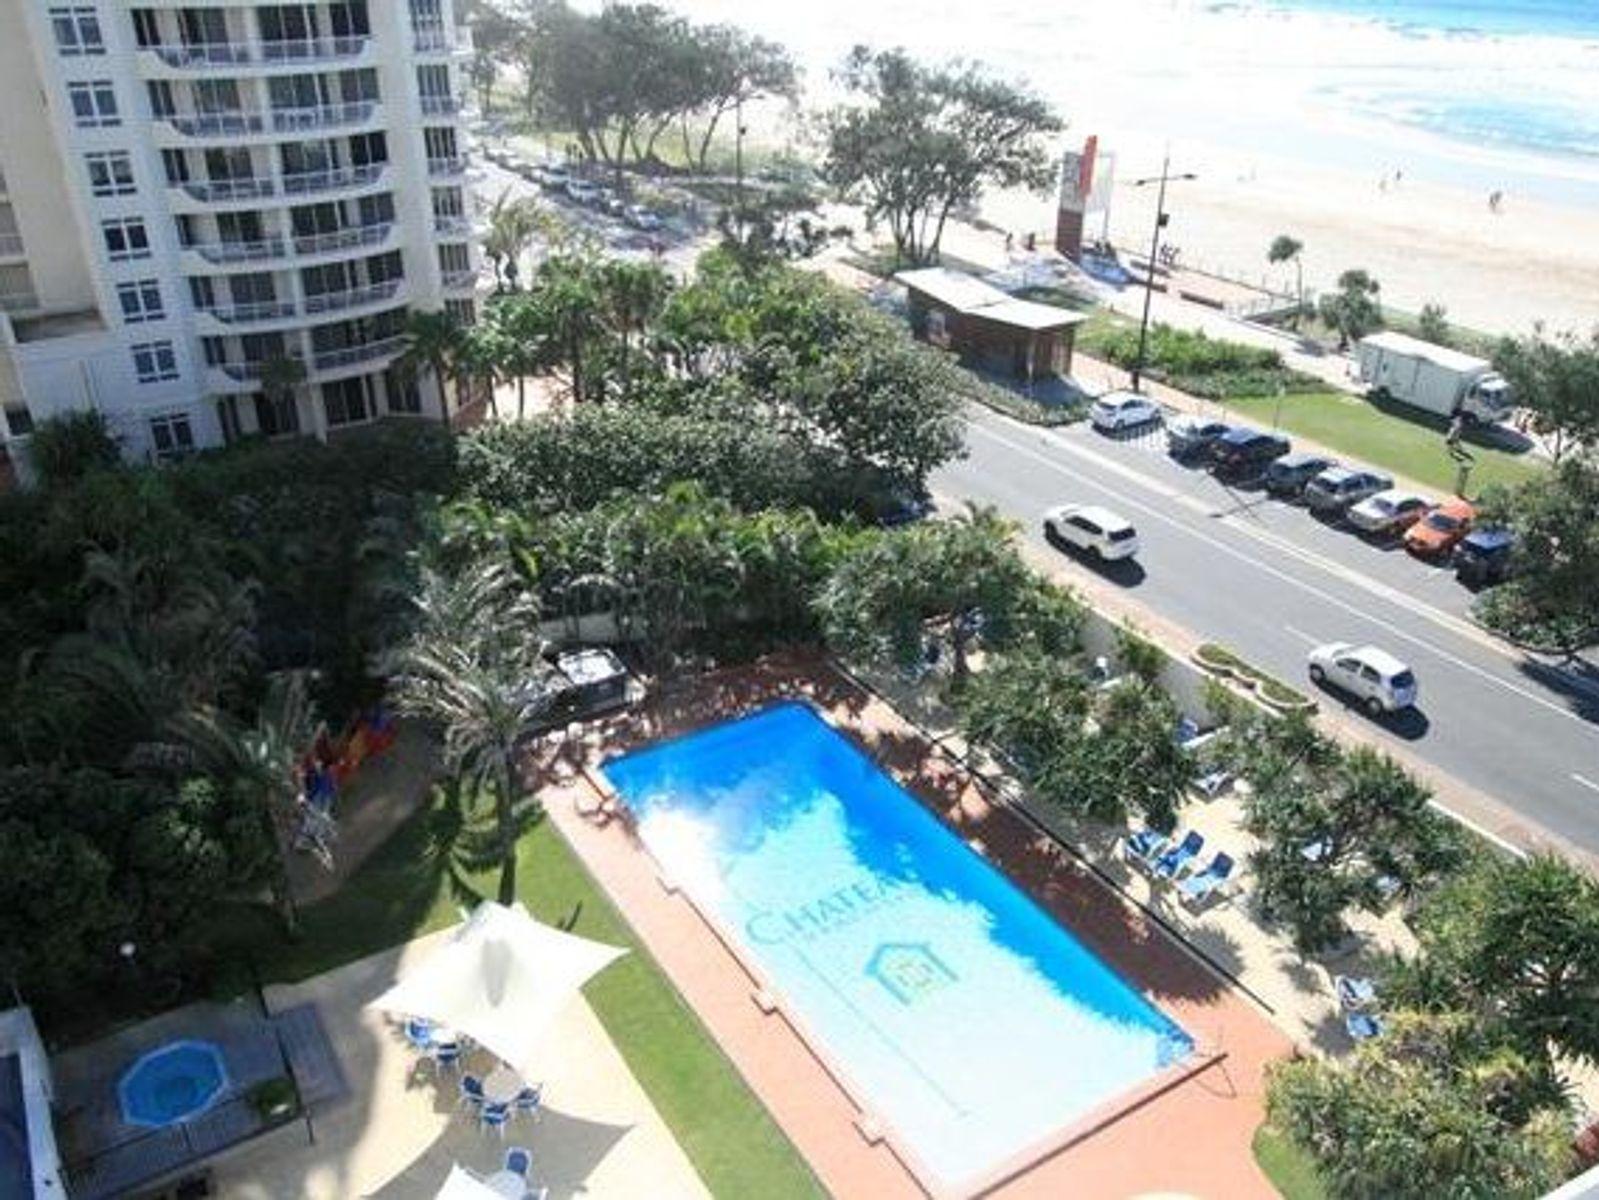 706/44 The Esplanade, Surfers Paradise, QLD 4217